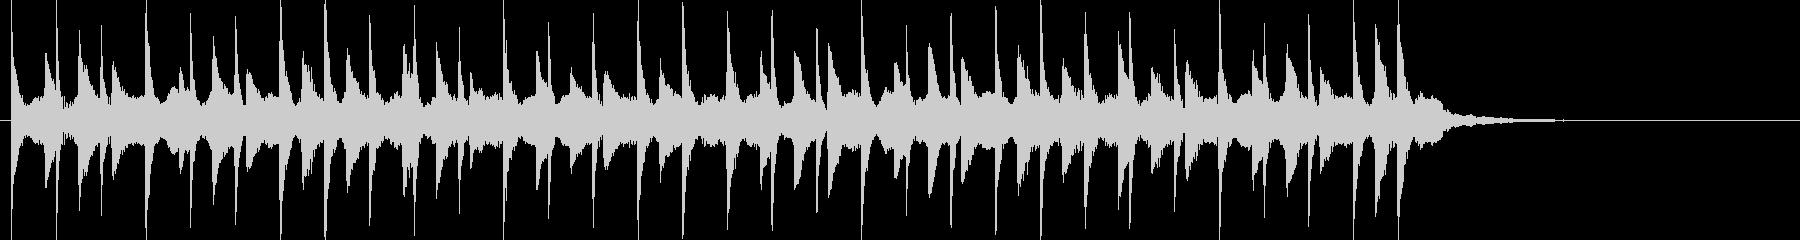 Corporate Synth 126の未再生の波形